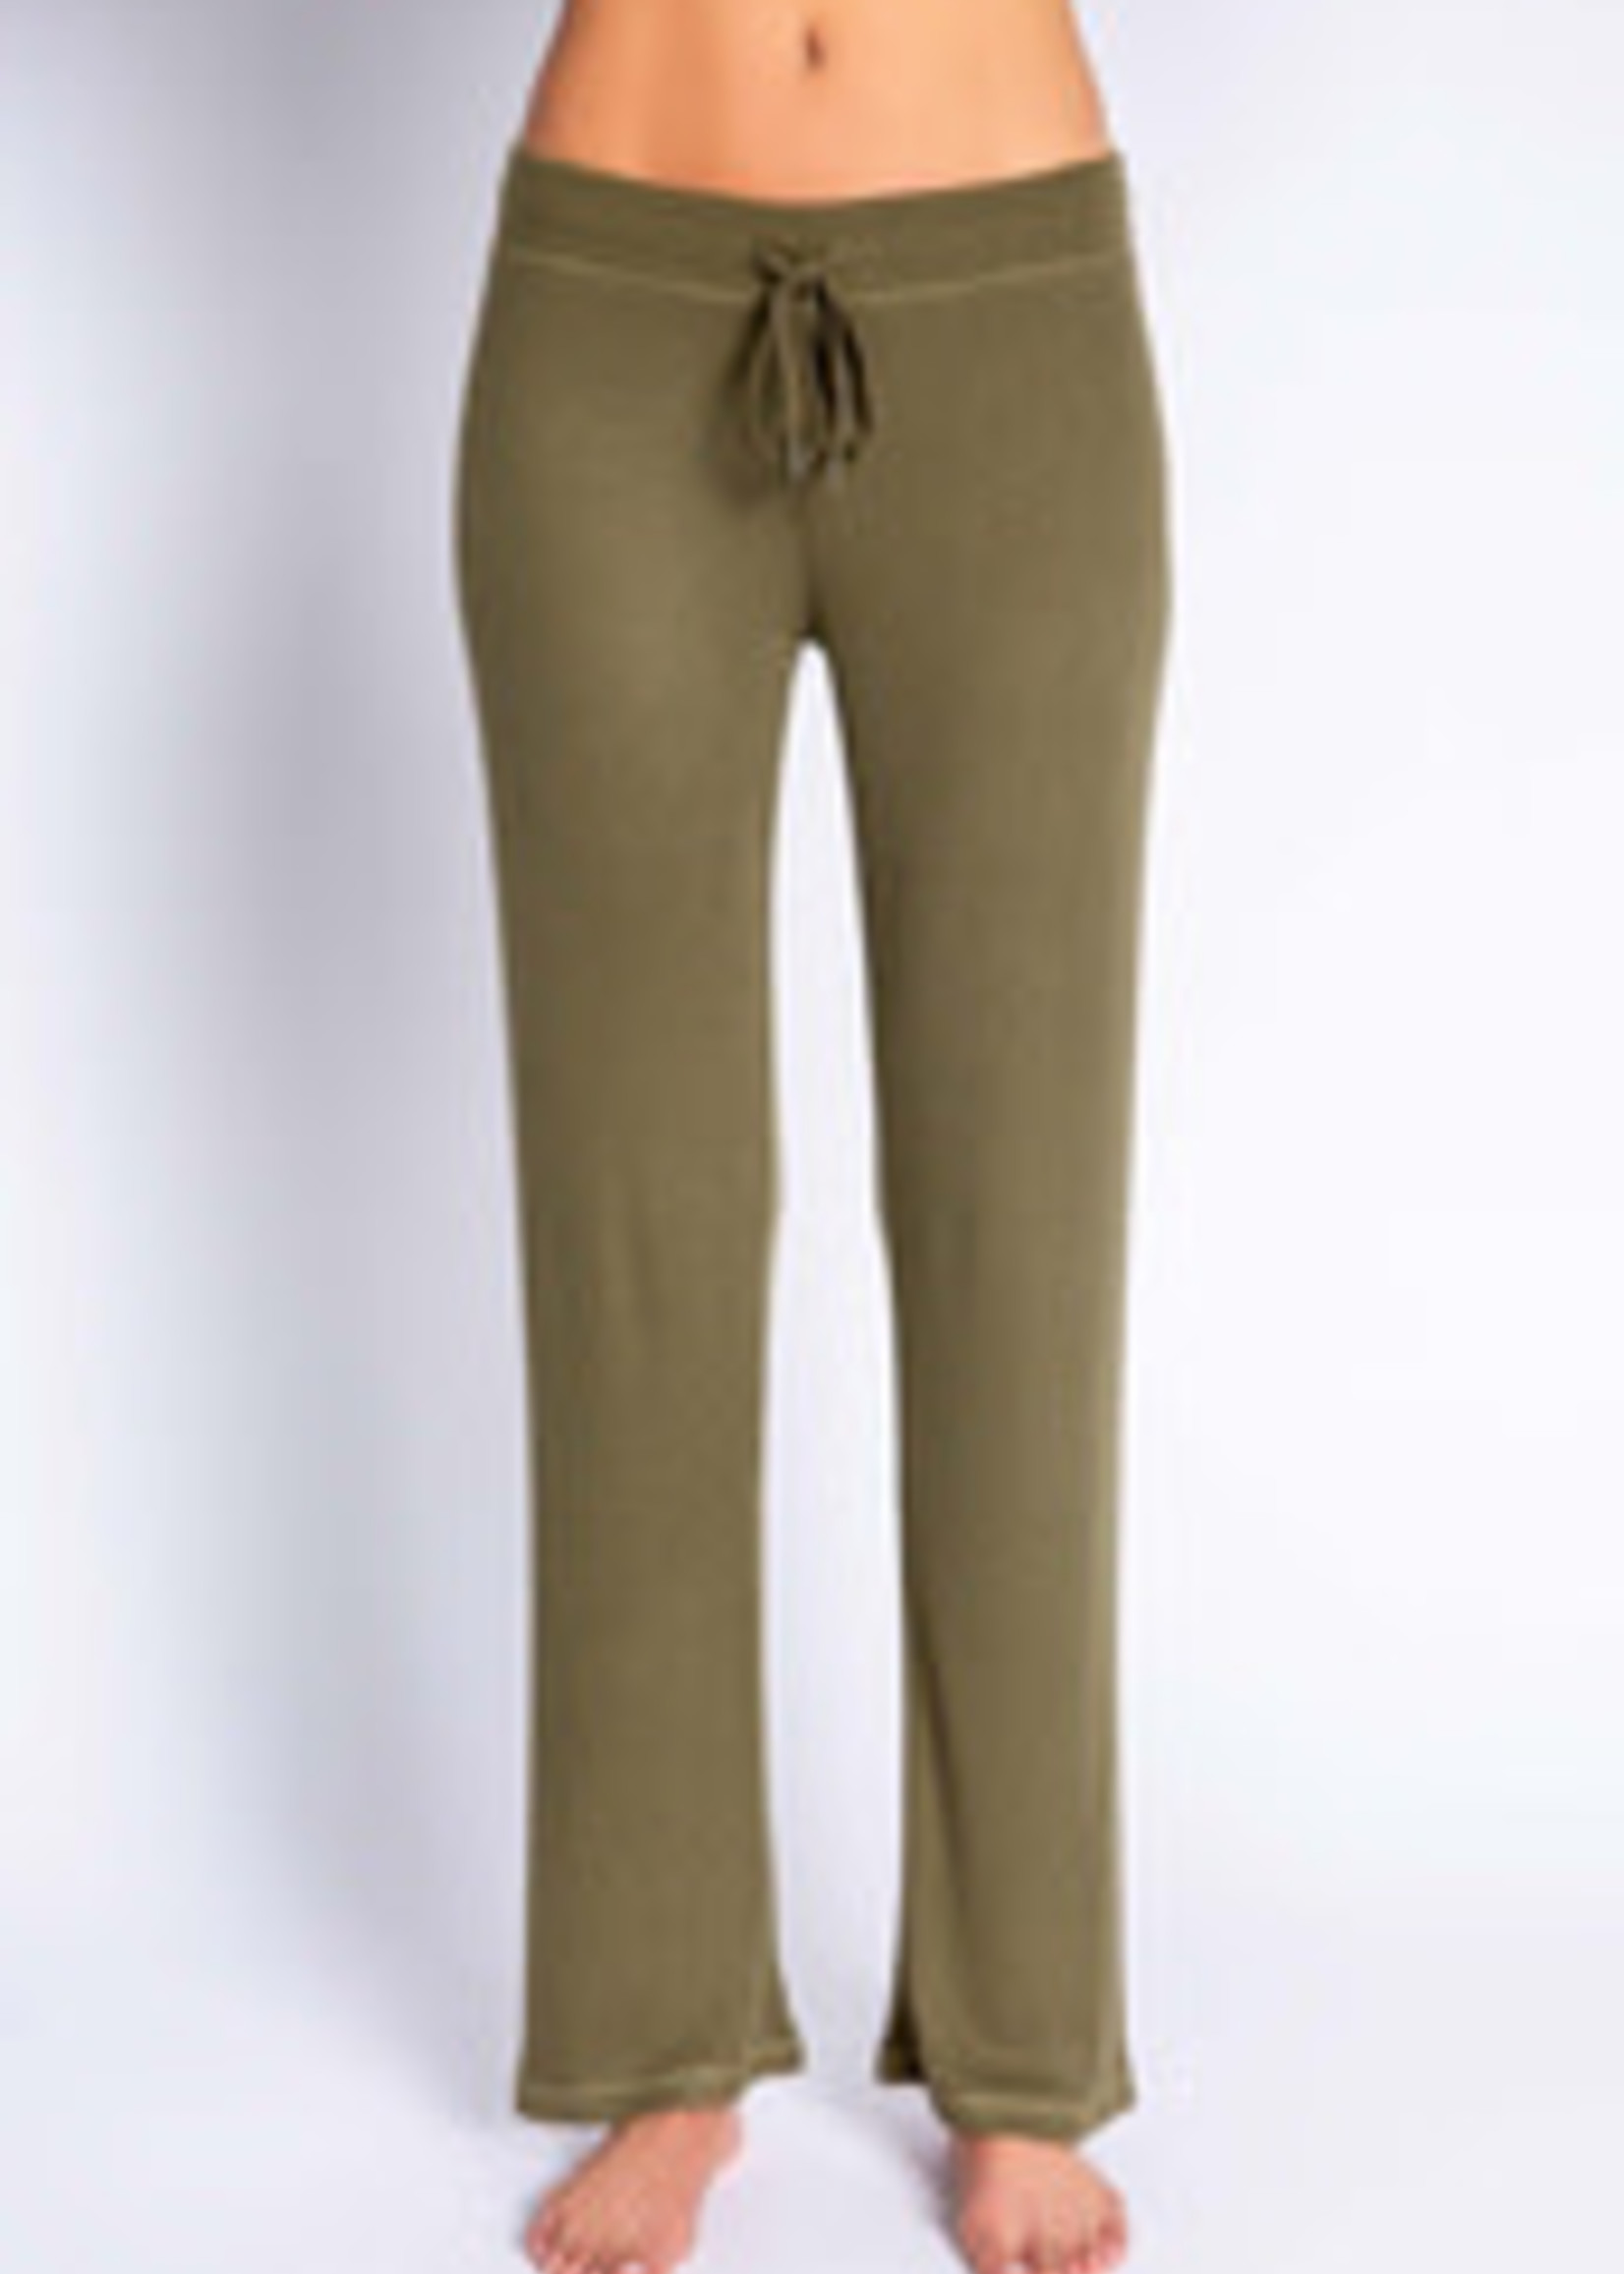 P.J. Salvage PJS - Basic Textured Lounge Pant (2 colors)